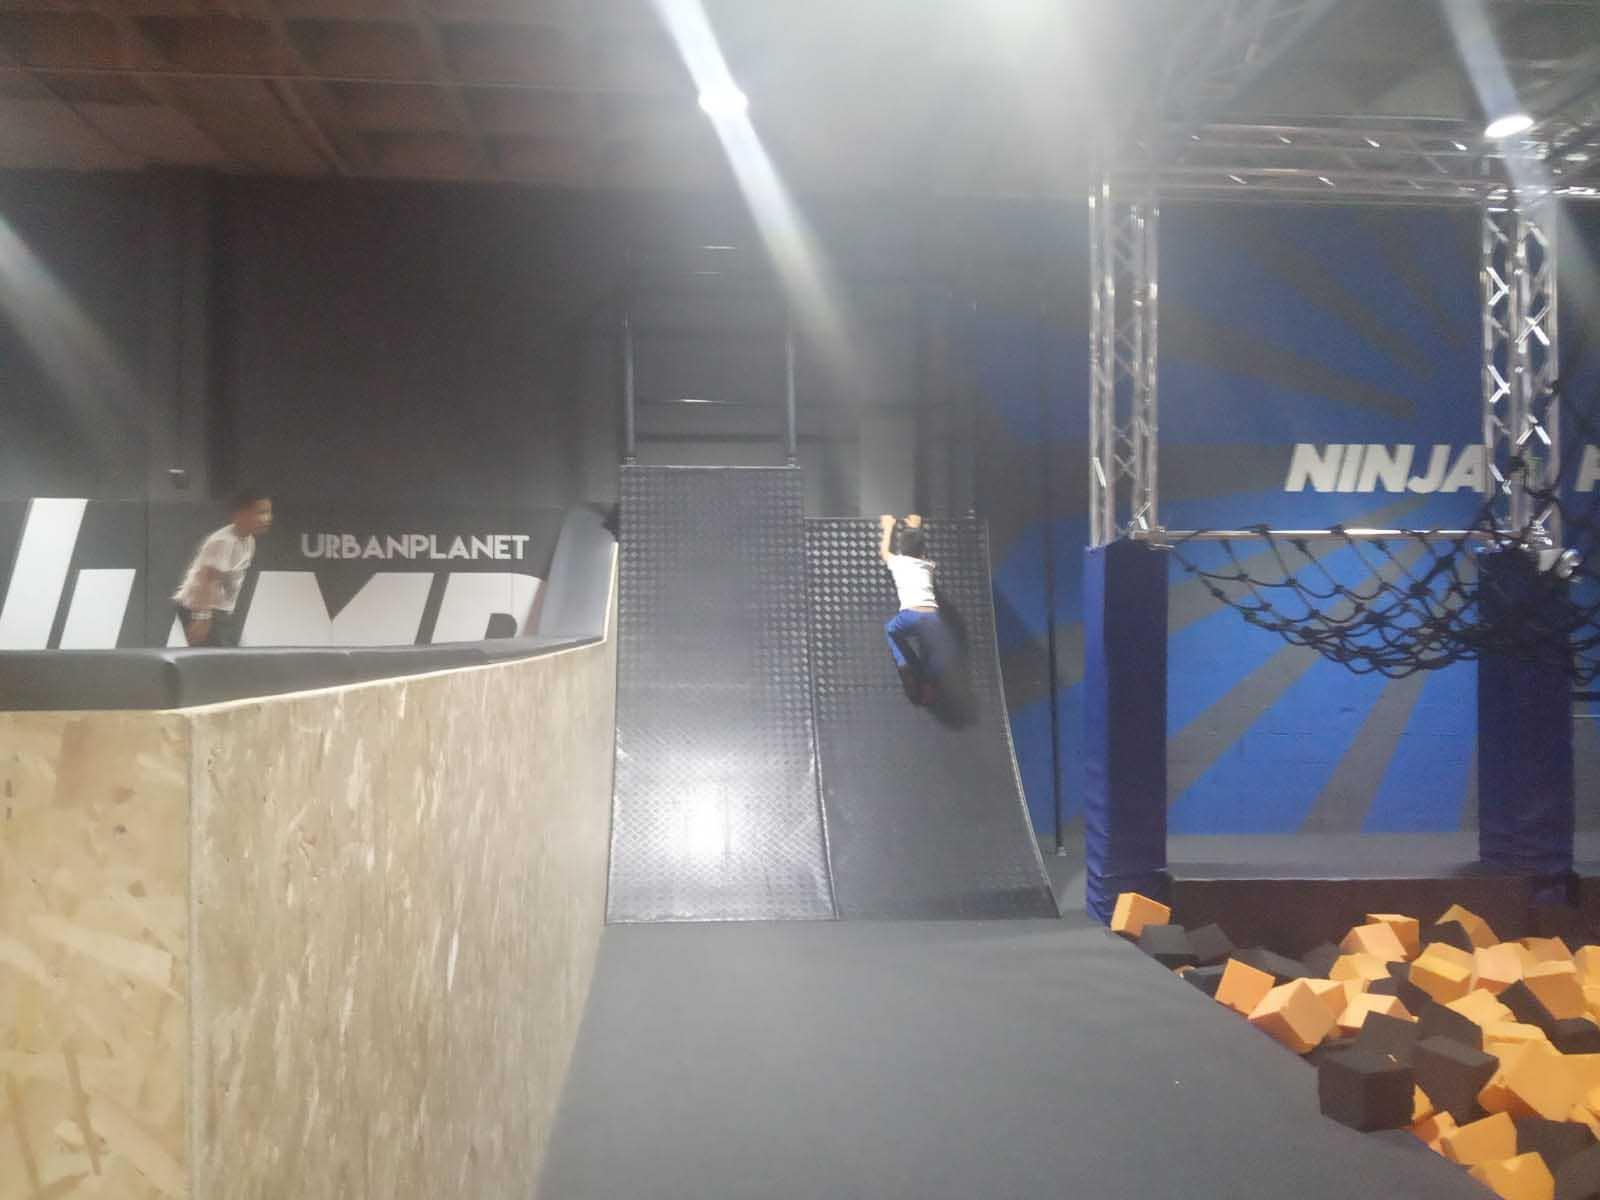 Zona Ninja